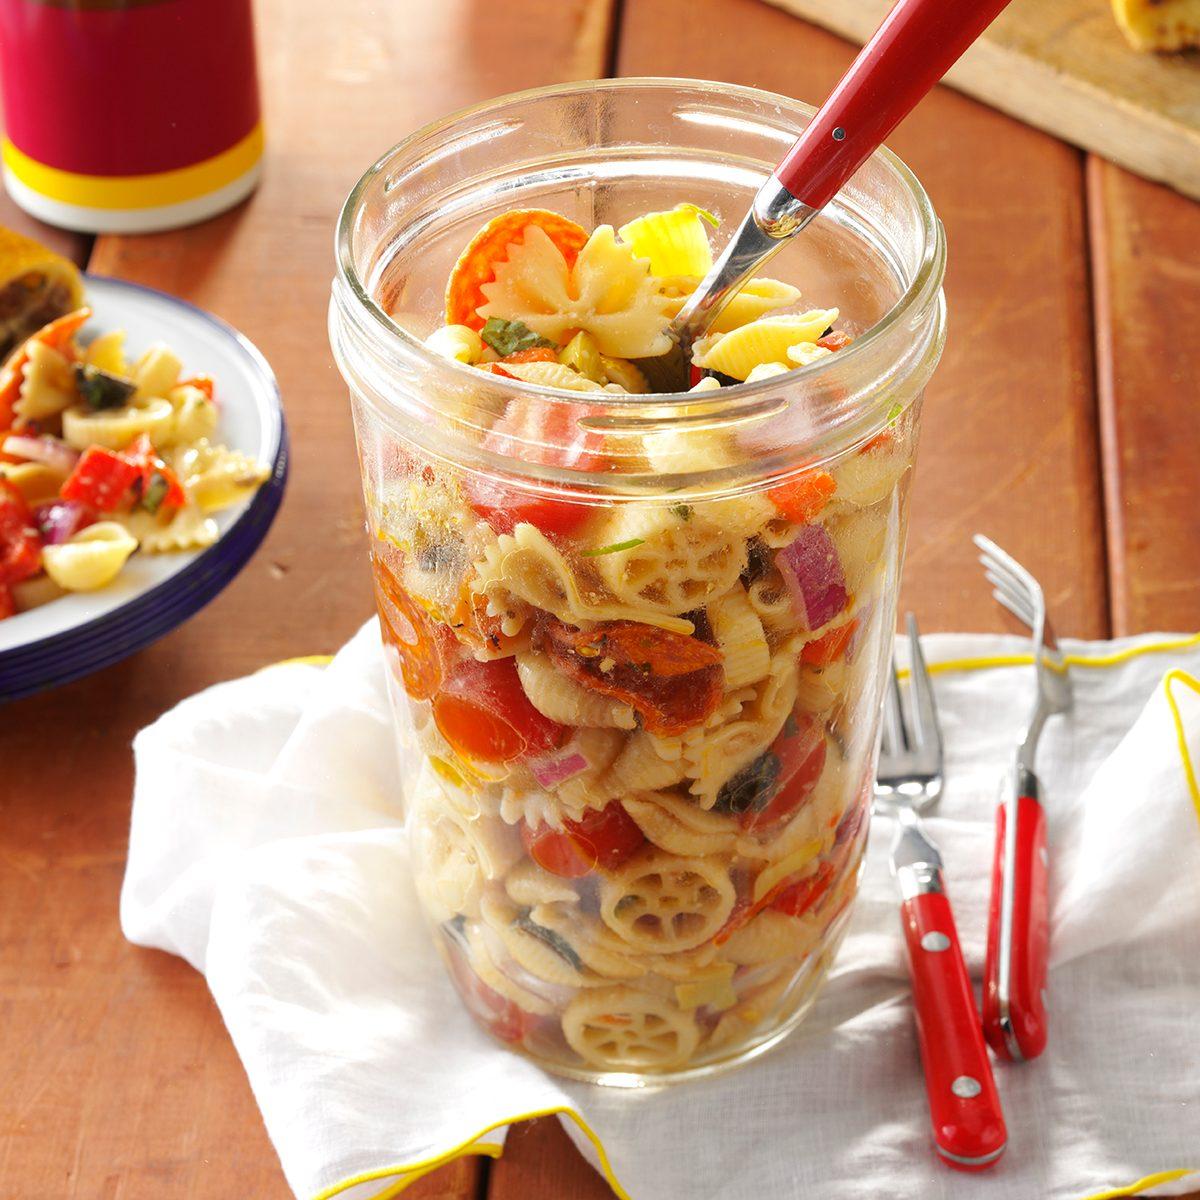 Easy School Lunch Ideas-Pasta Salad in a Jar